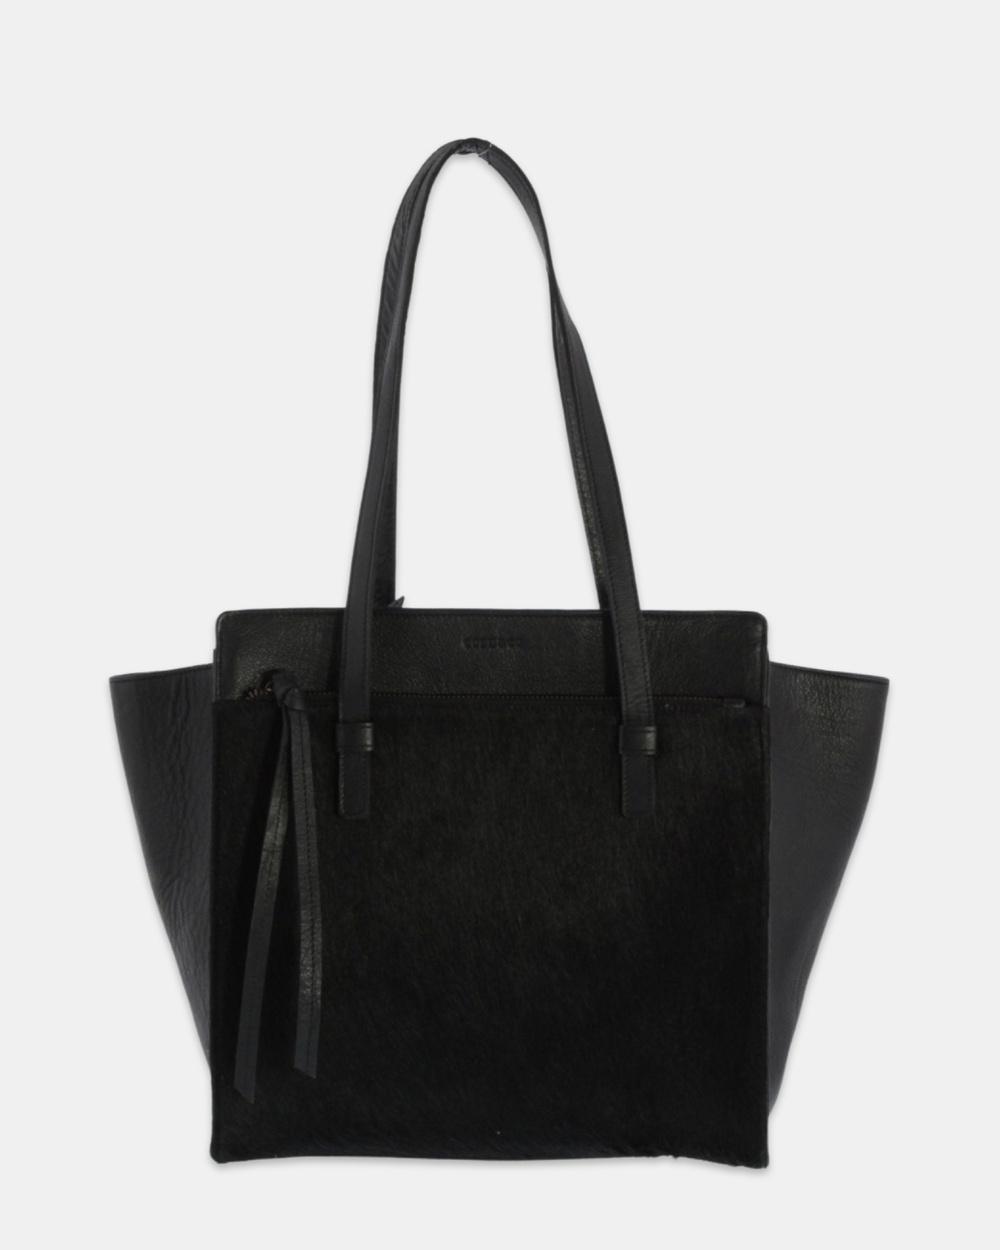 Cobb & Co Safari Balmain Pony Hair Leather Tote Bags Black